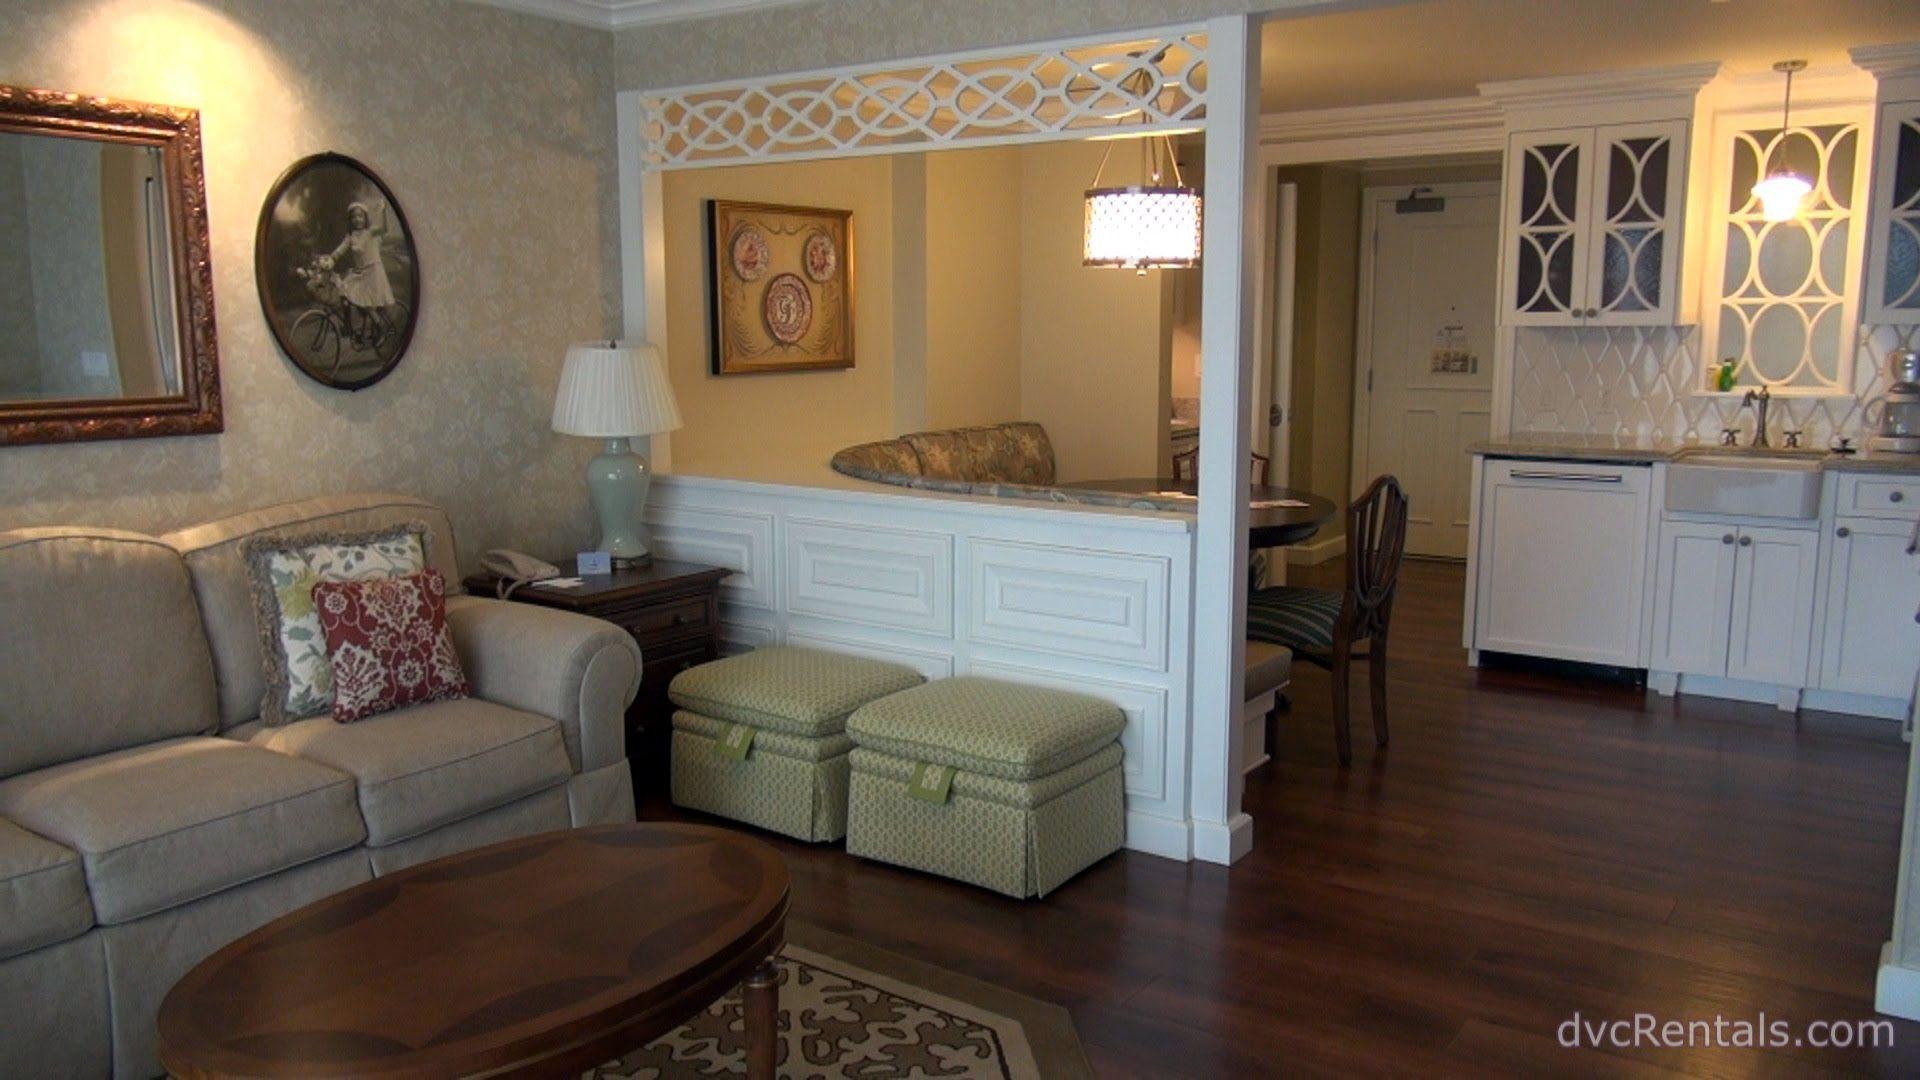 VILLAS AT DISNEY'S GRAND FLORIDIAN RESORT & SPA ROOM